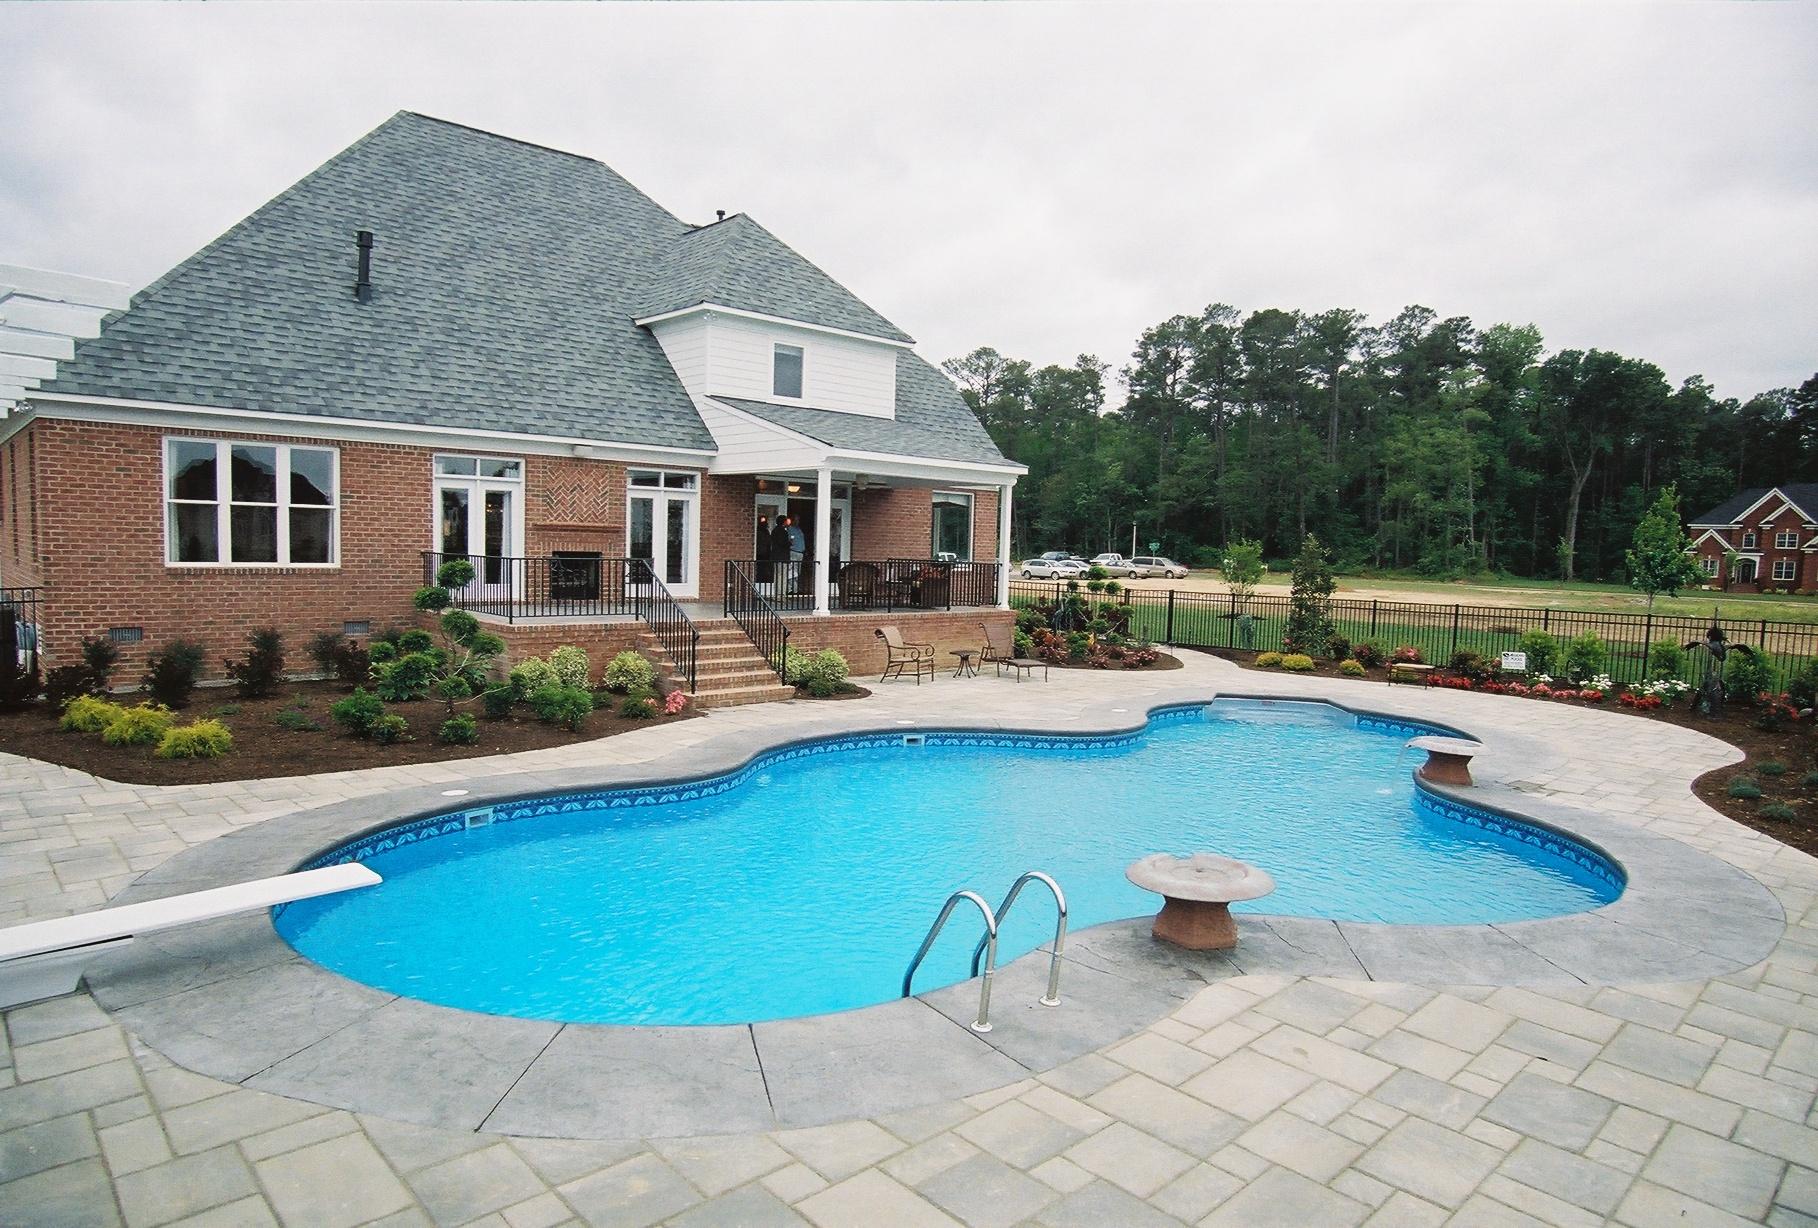 Freeform liner pool 3